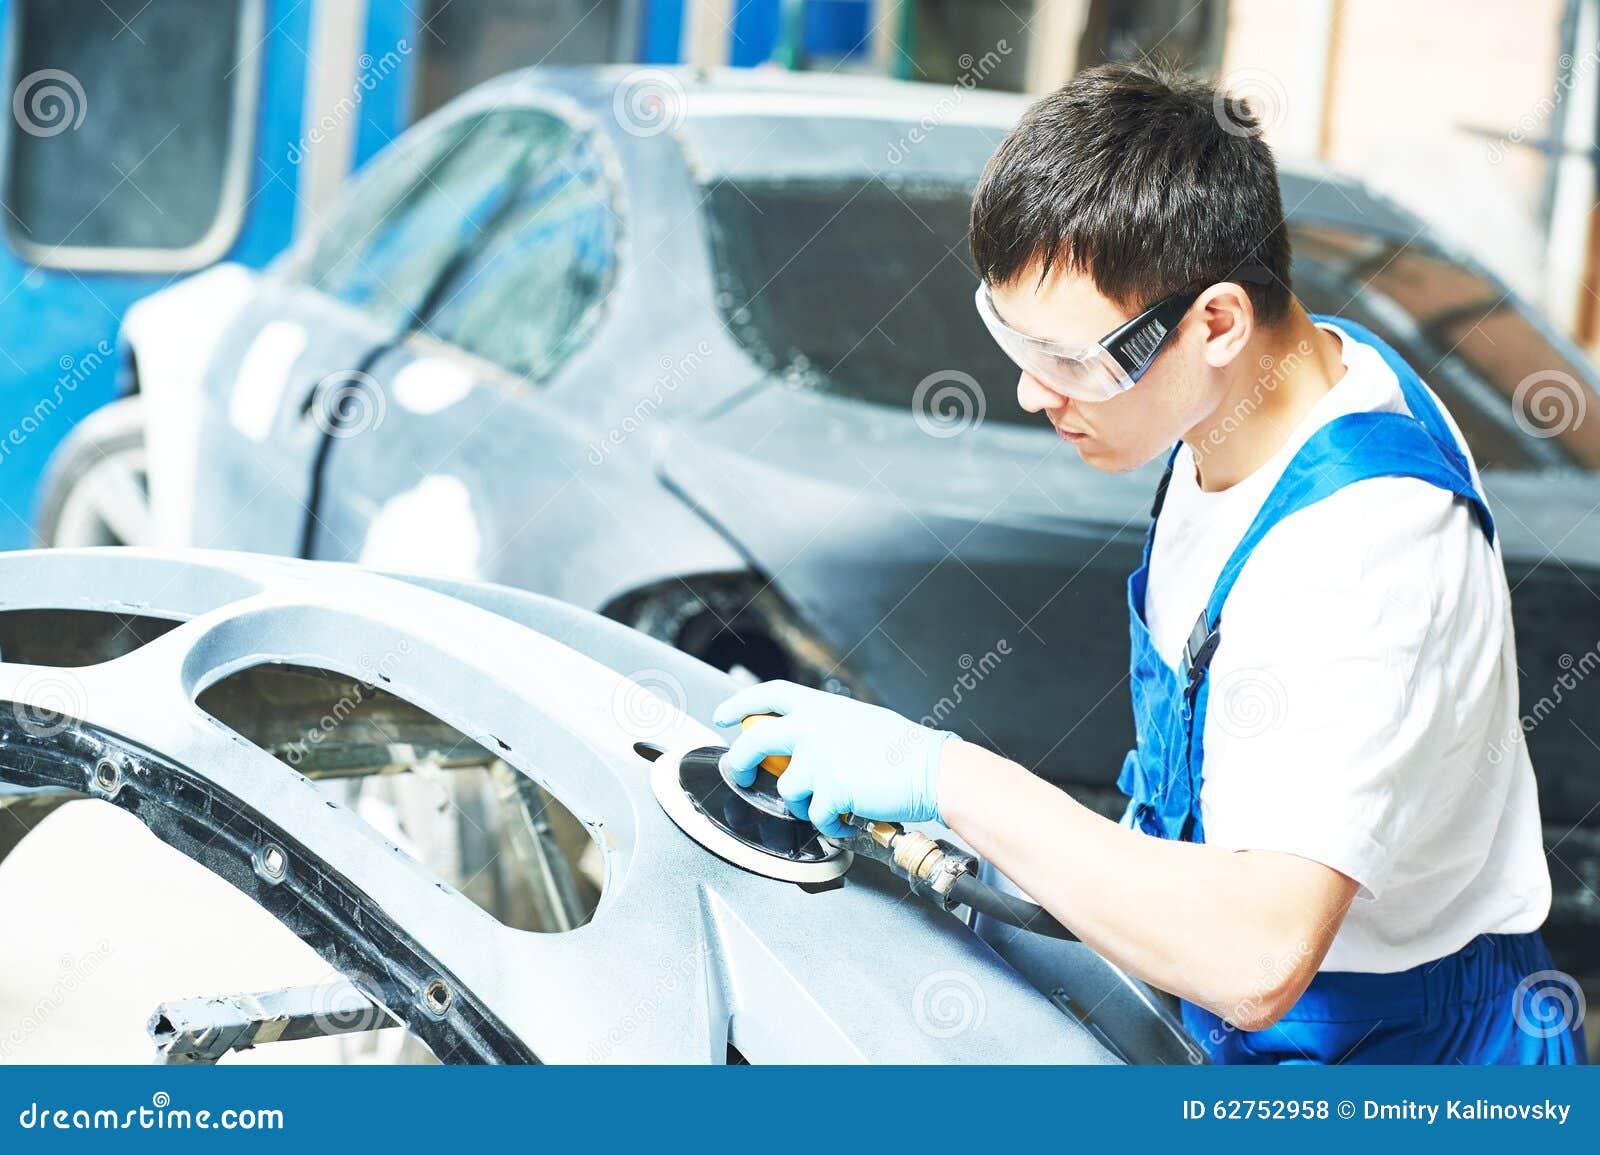 Car Surface Buffing Renewing Using Polish Machine besides C Md moreover Rehi Upcncrehi Upcnca besides Maxresdefault together with Makita C Rotary Polisher Inch Foam Pad Kit Free Bonus. on car buffing machine